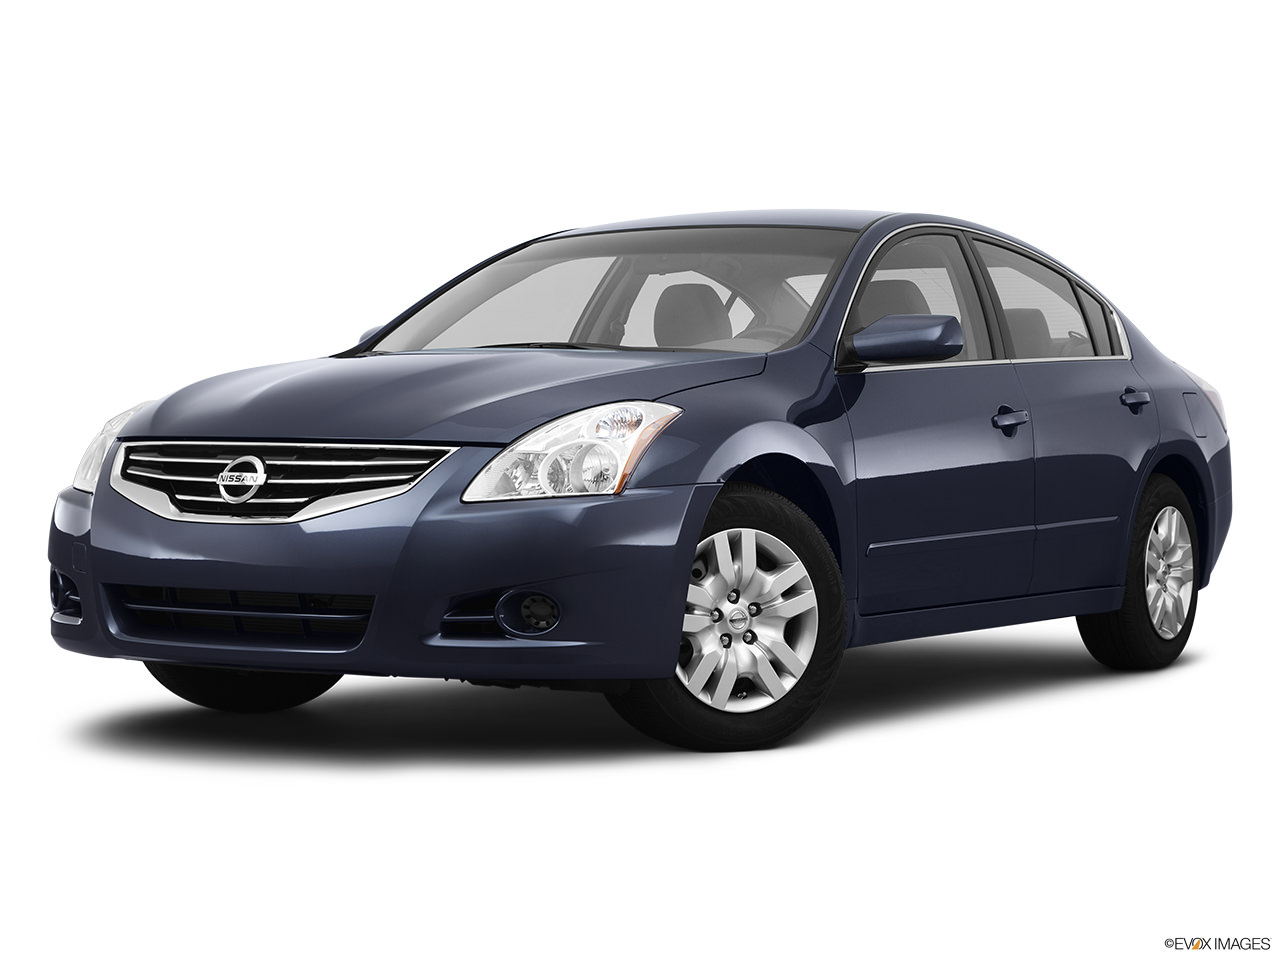 ImageDescription Nissan Altima 2012